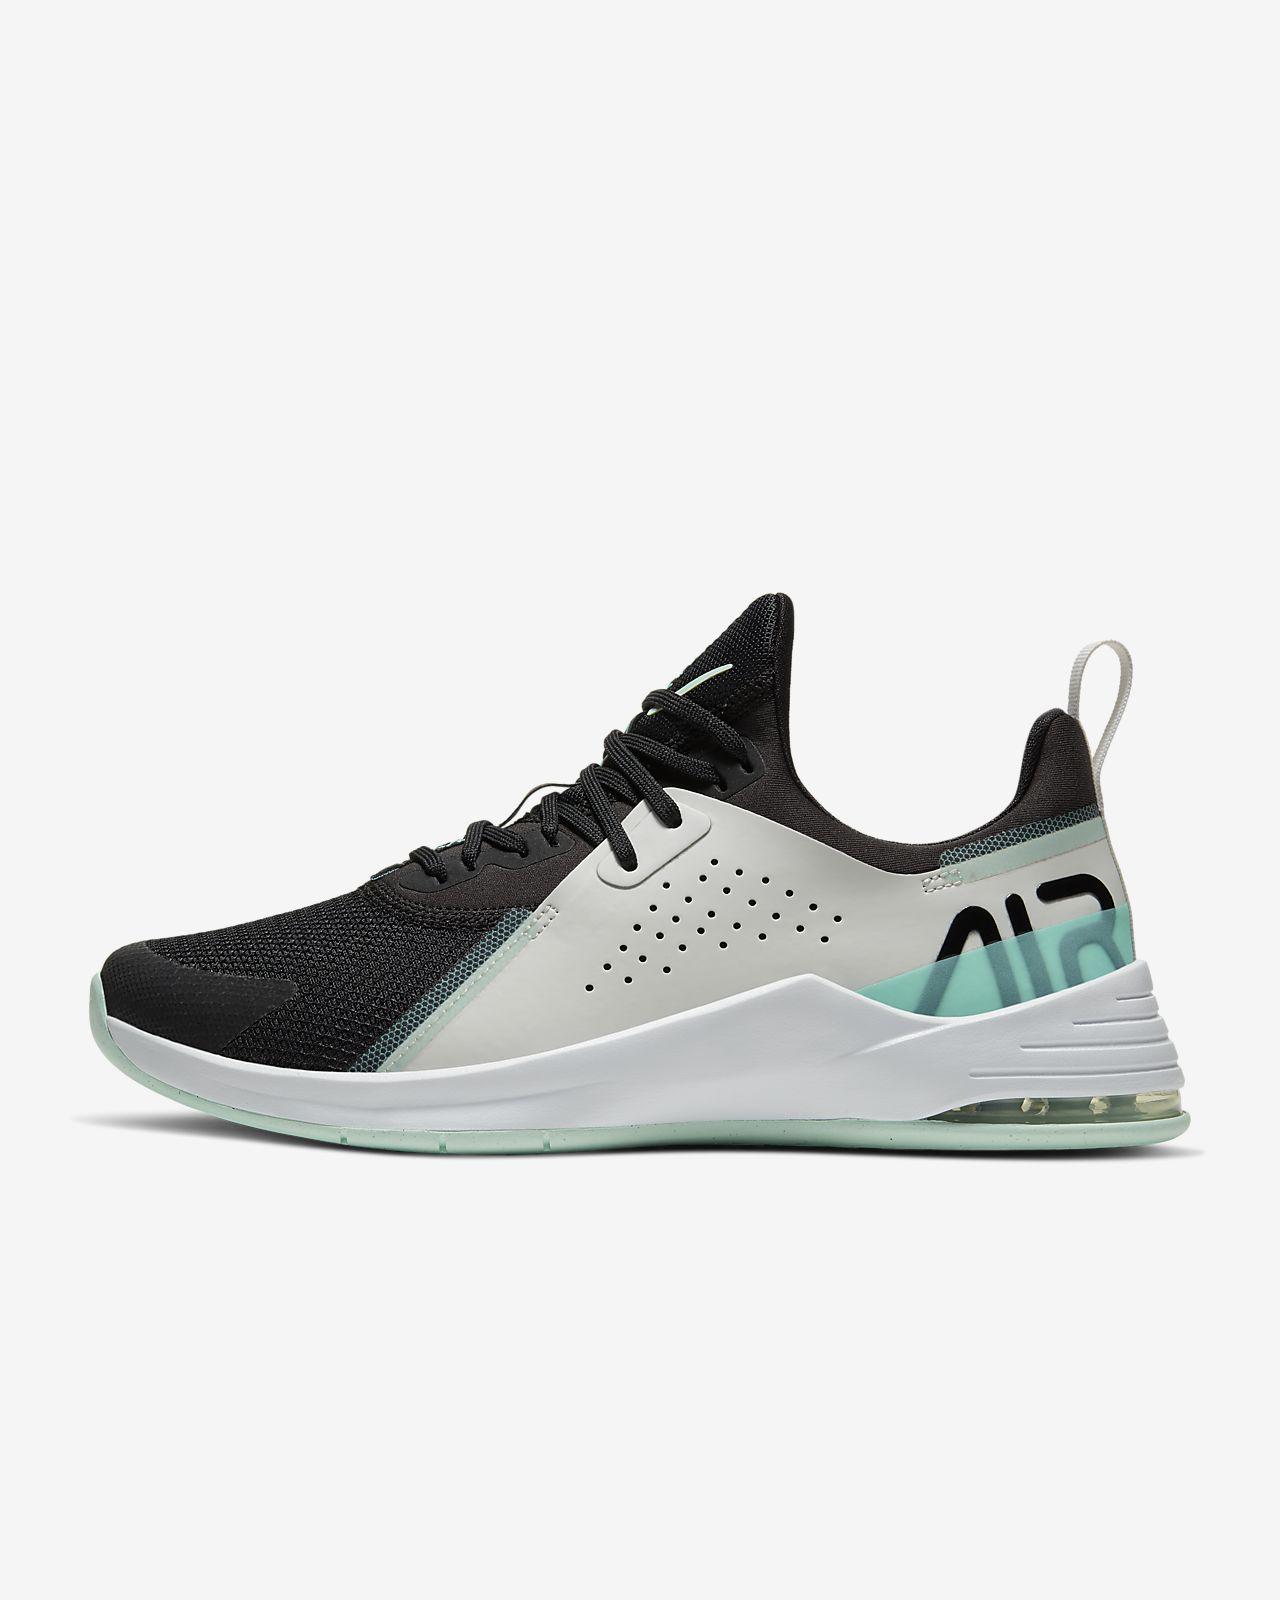 nike air max basketball referee shoes